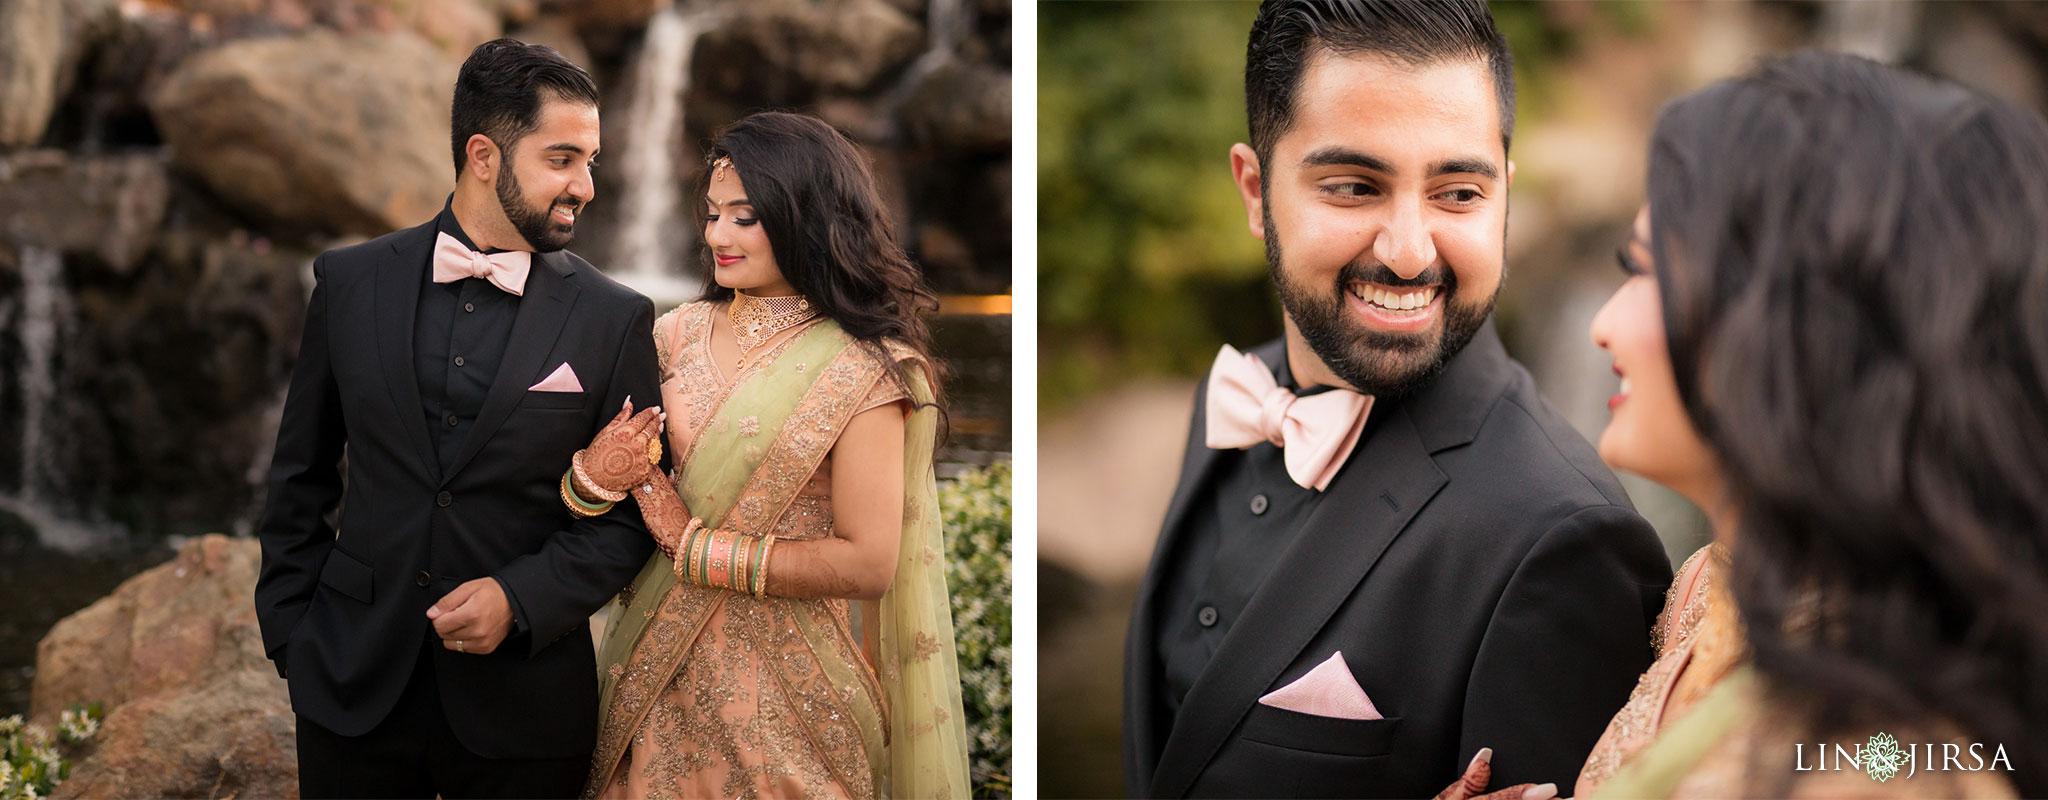 44 four seasons westlake village indian wedding photography